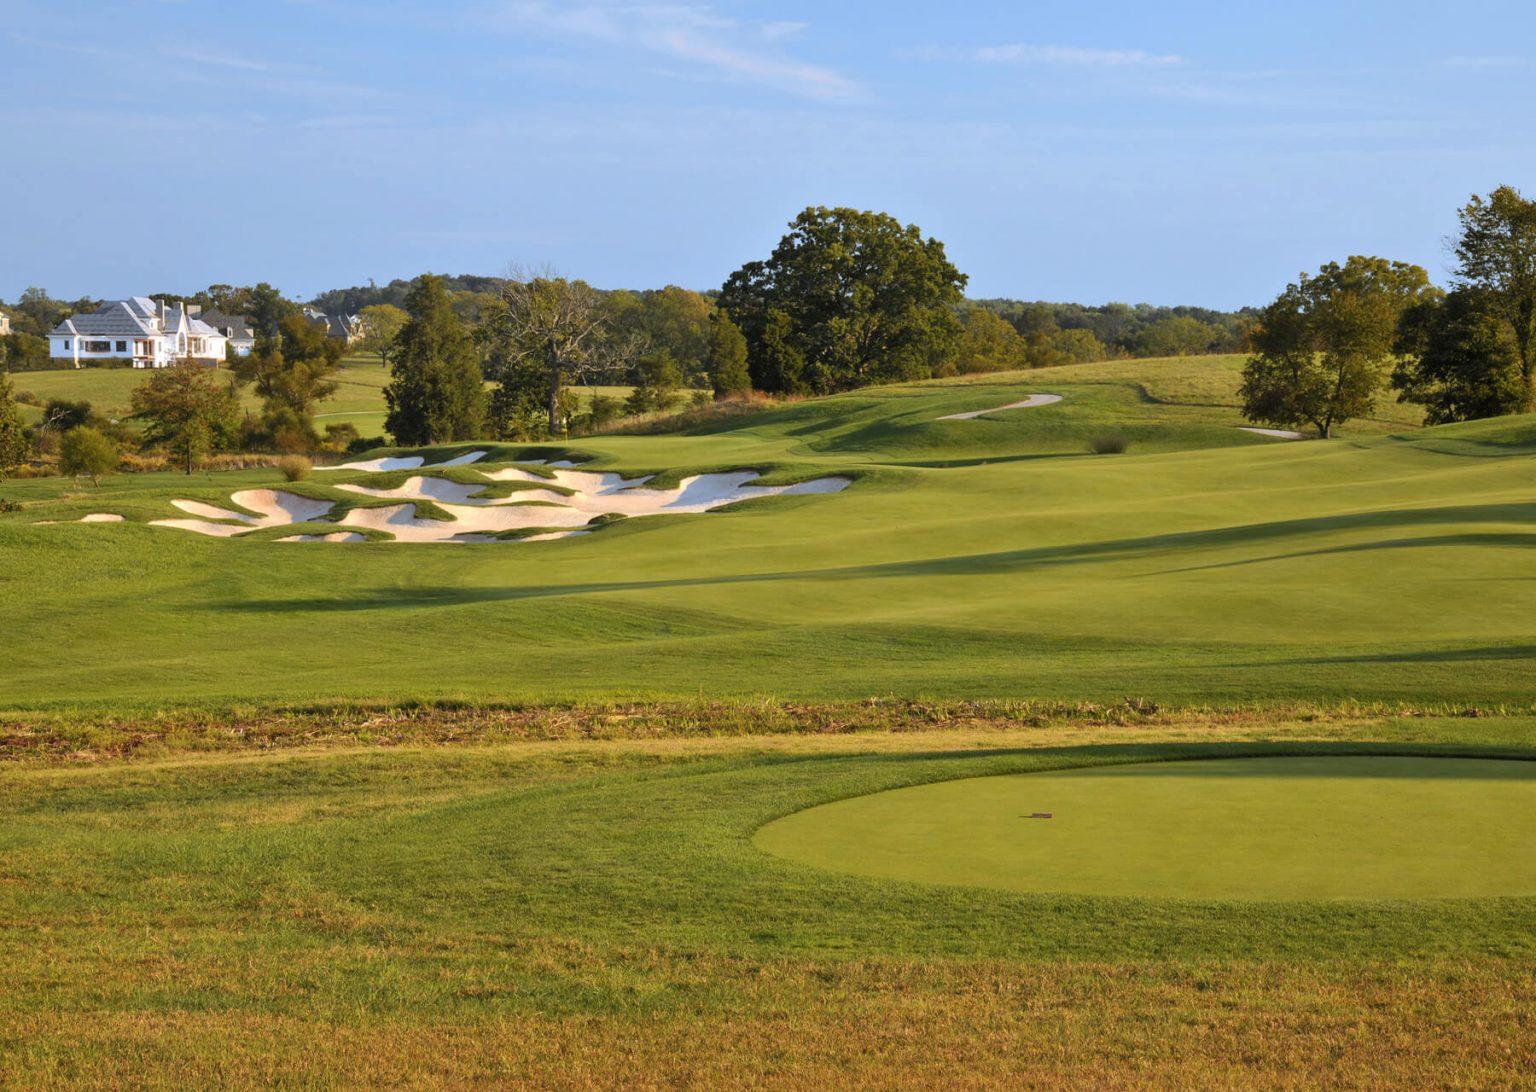 creighton farms golf course first hole